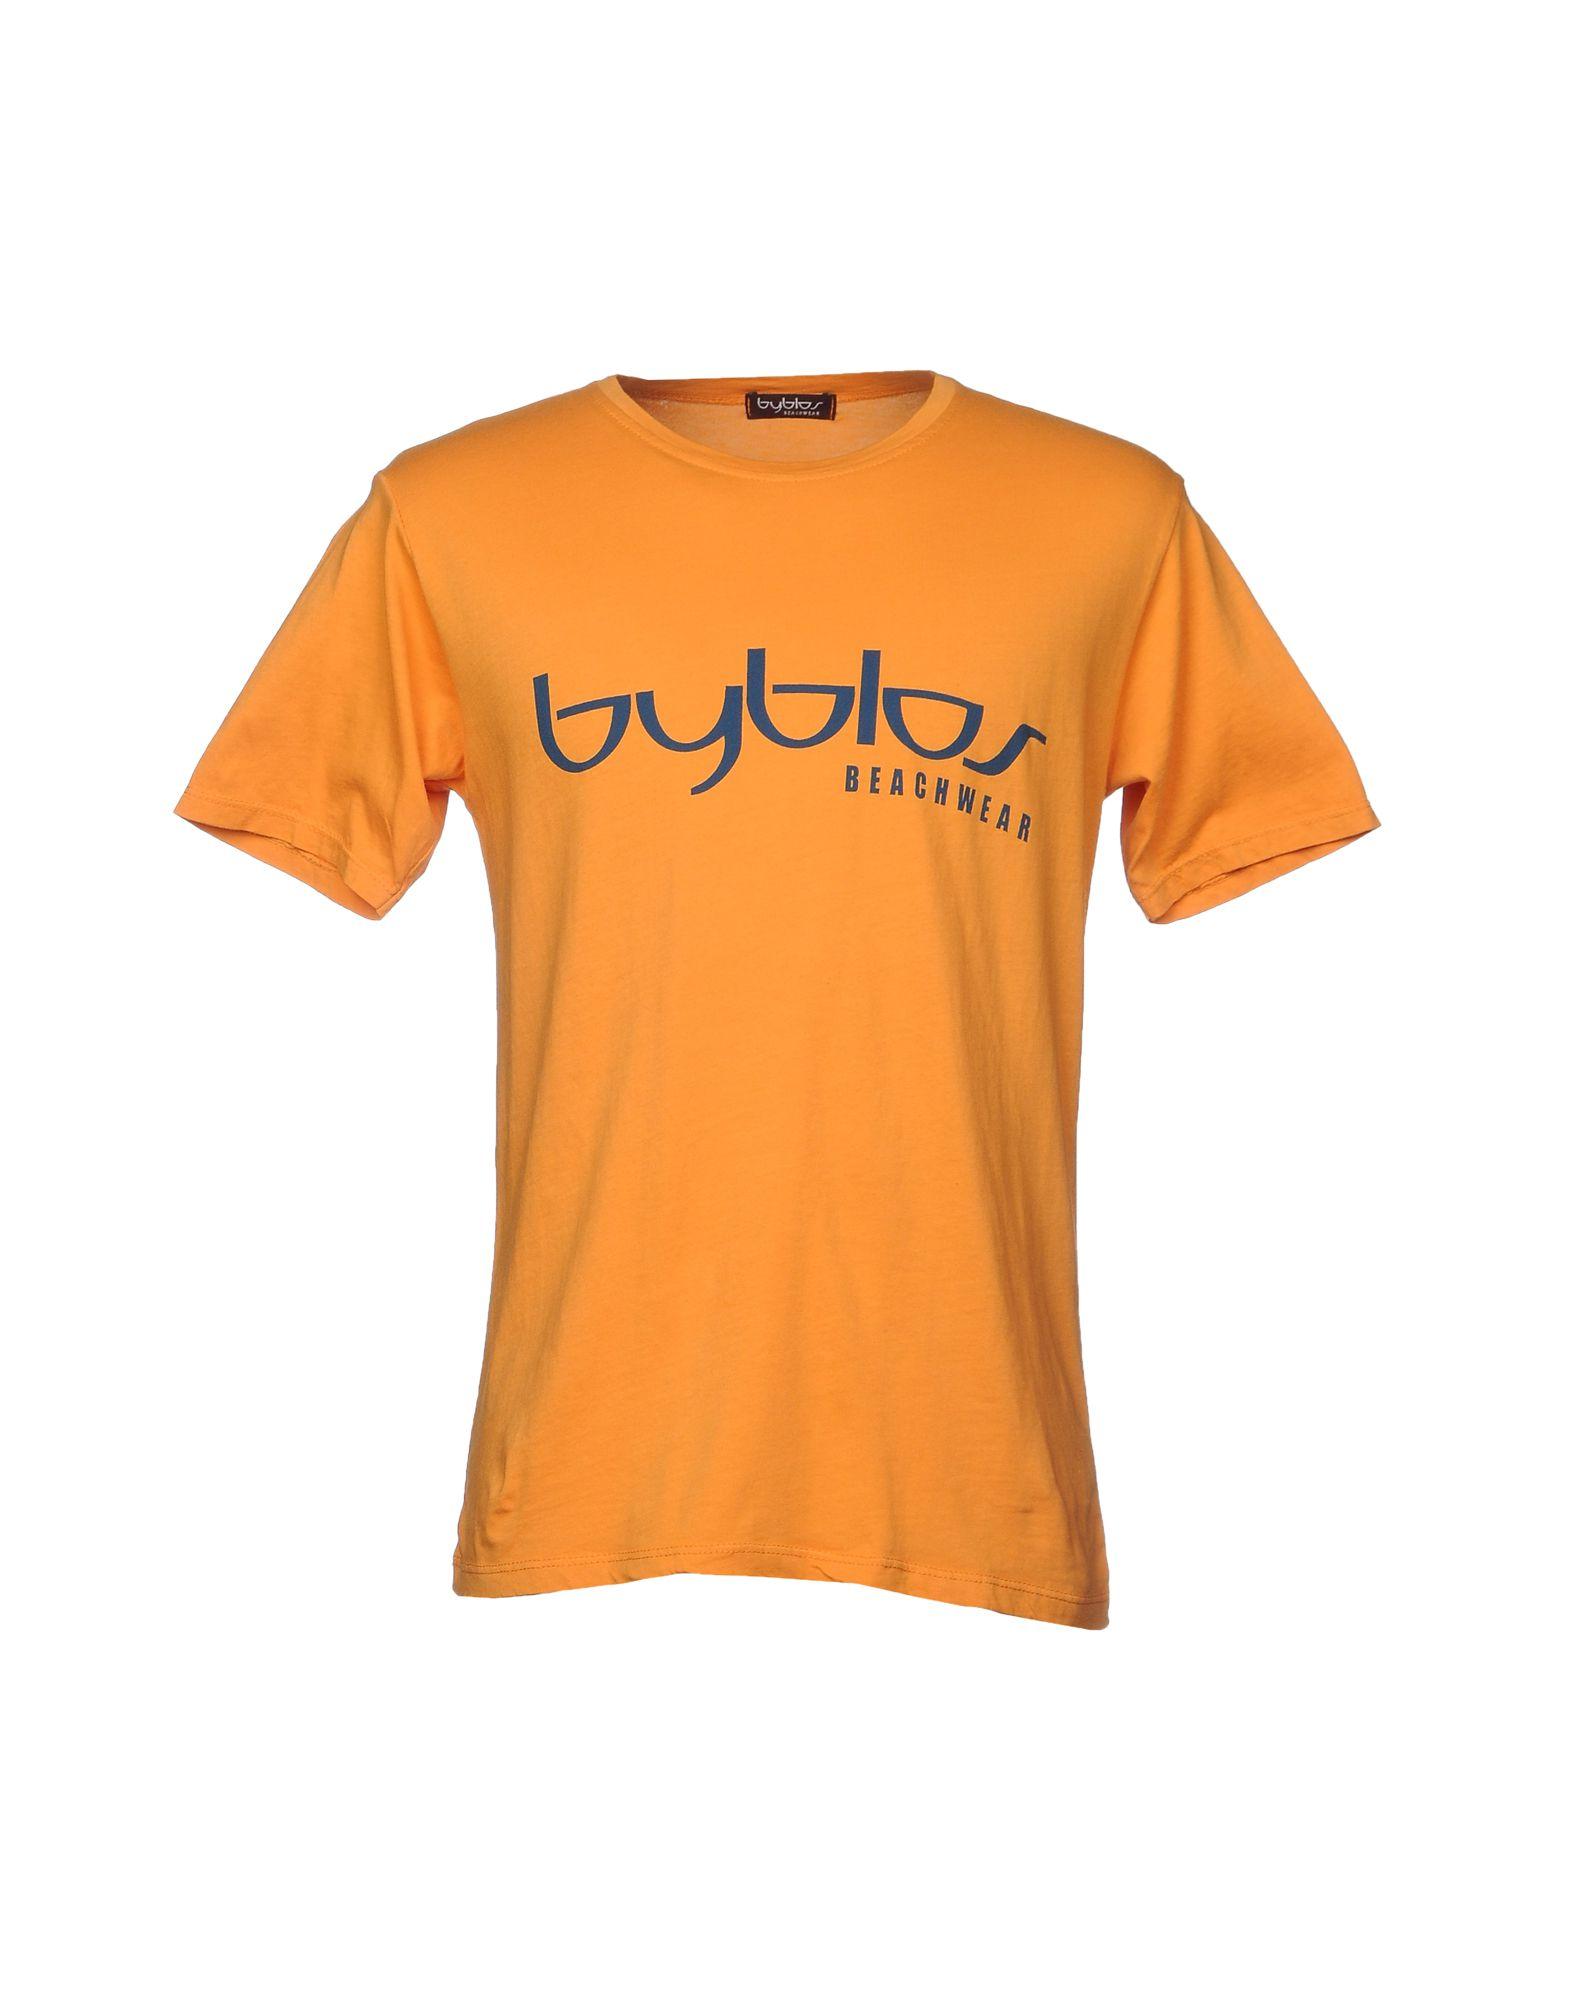 BYBLOS BEACHWEAR Футболка byblos футболка водолазка комплект для девочки bj6388 разноцветный byblos